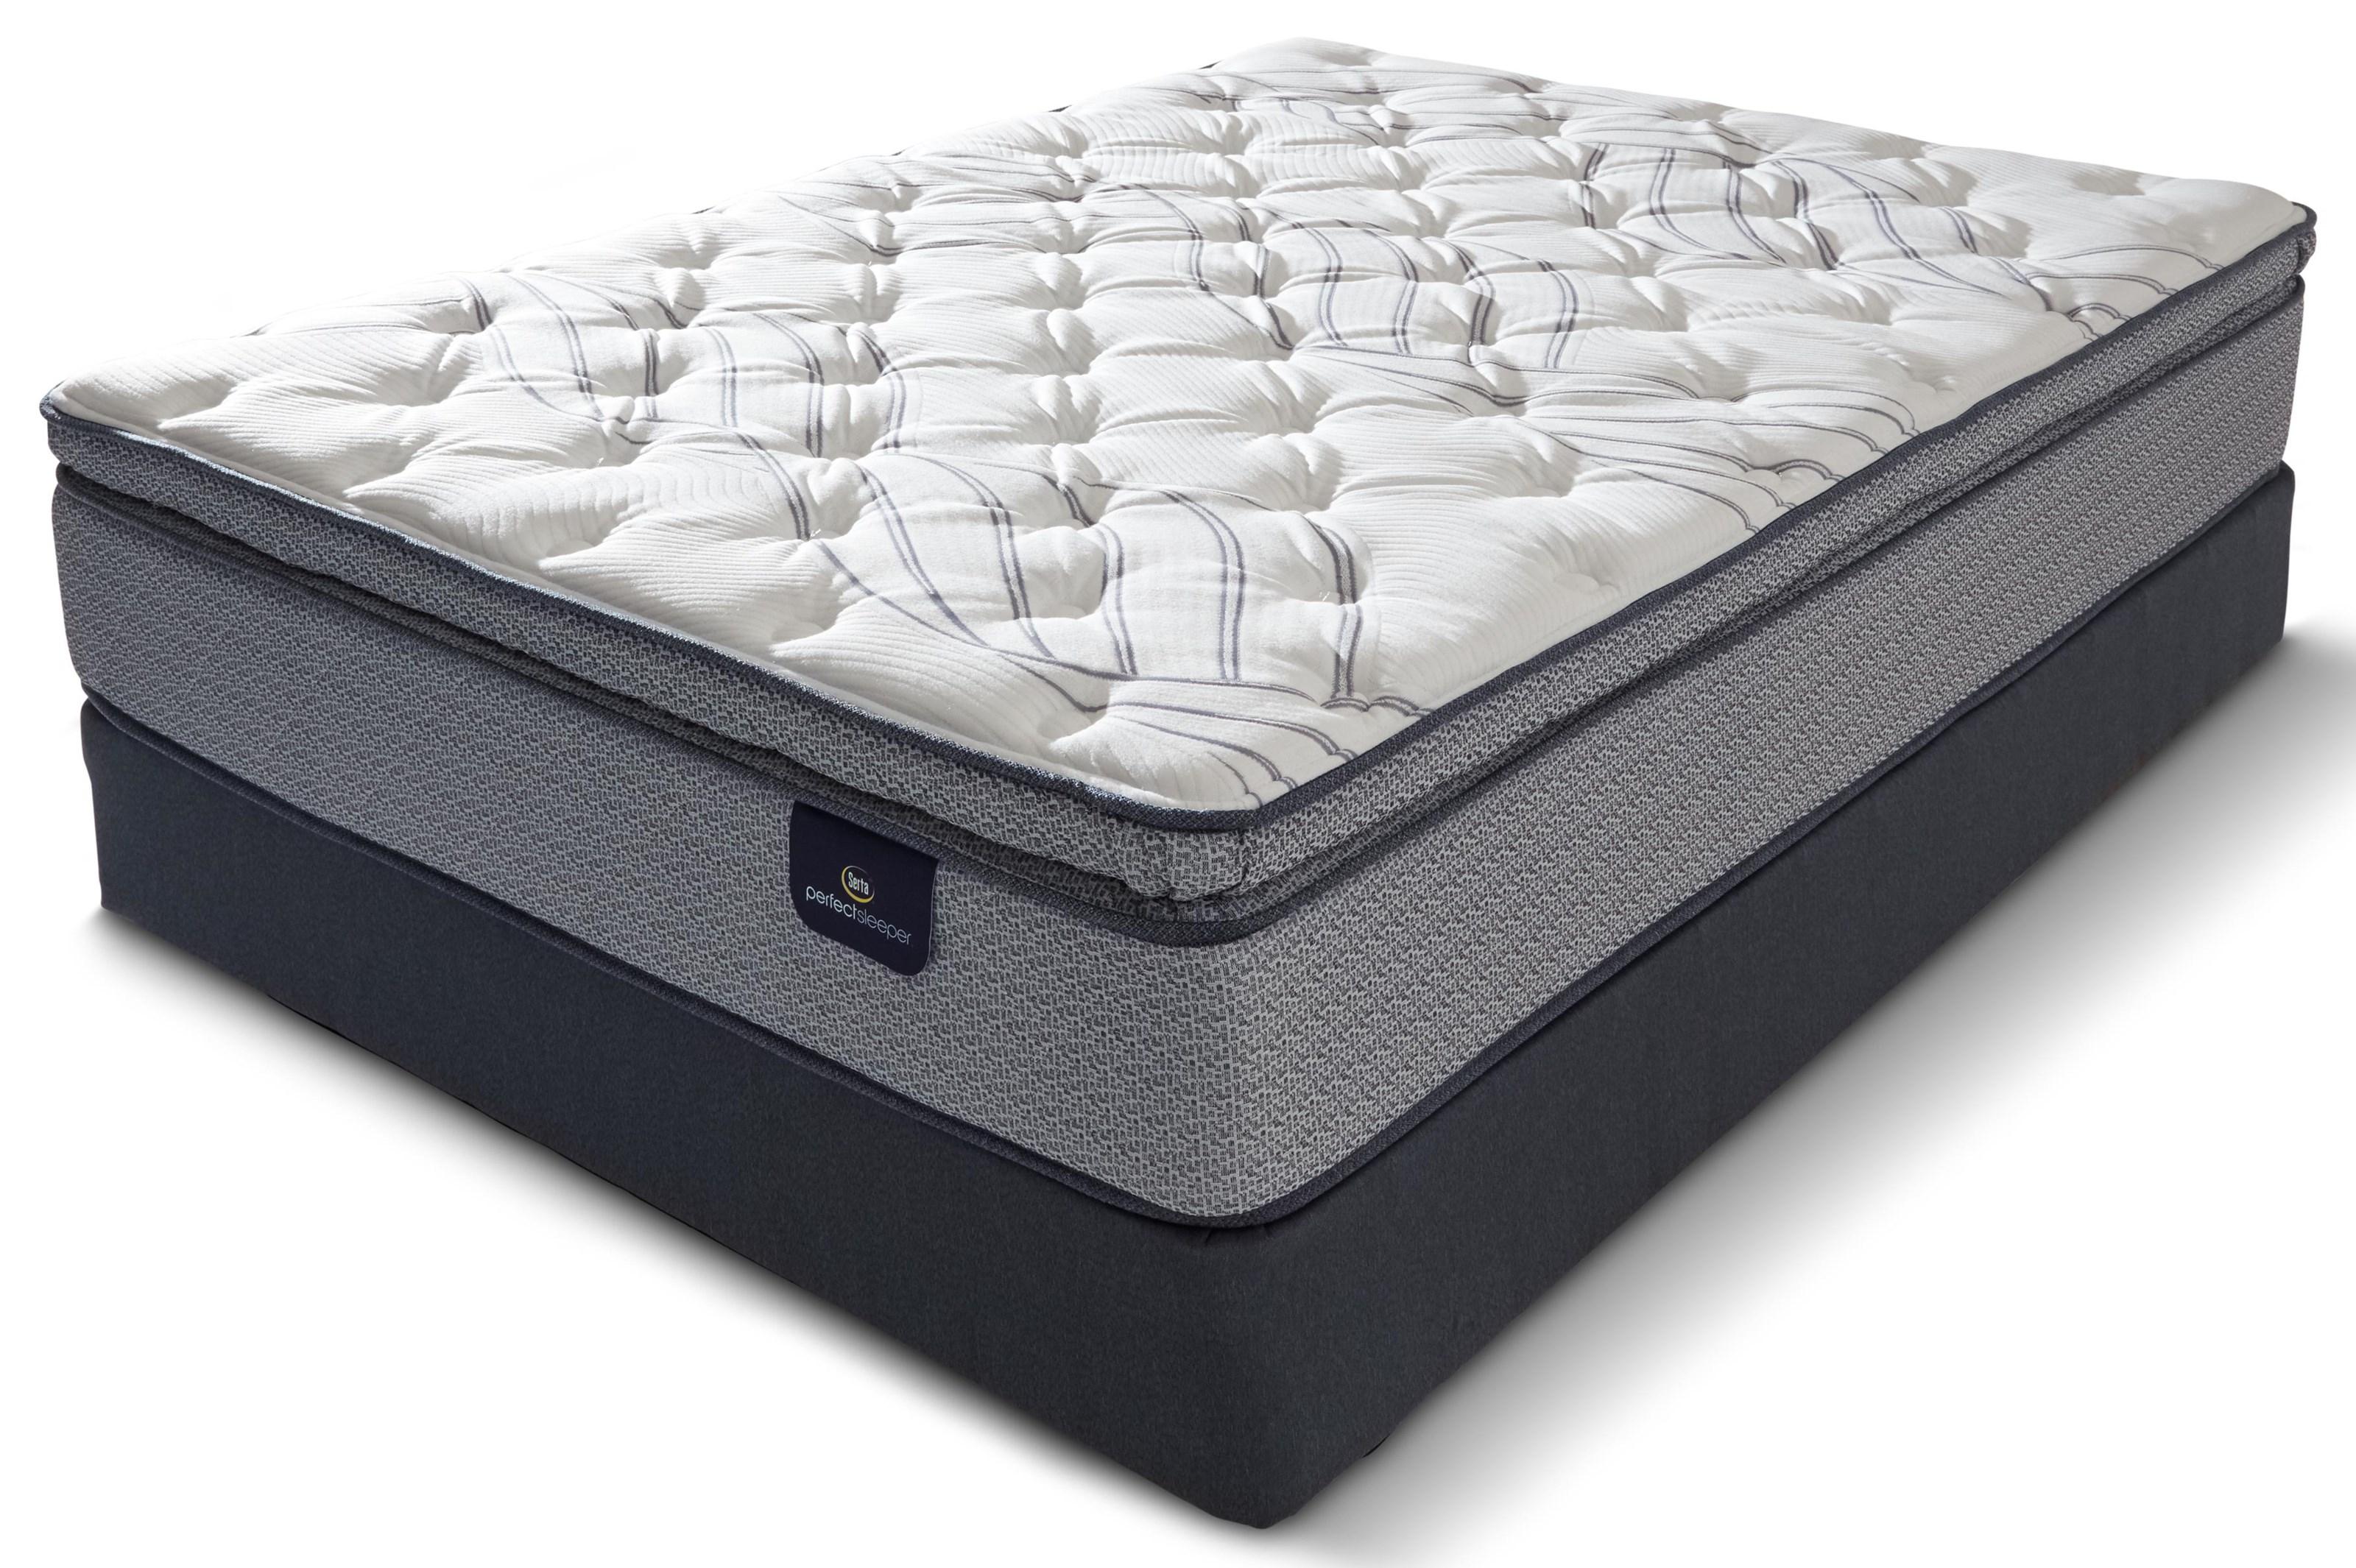 Aiden Perfect Sleeper KG AIDEN PILLOW TOP MATTRESS by Serta Canada at Stoney Creek Furniture